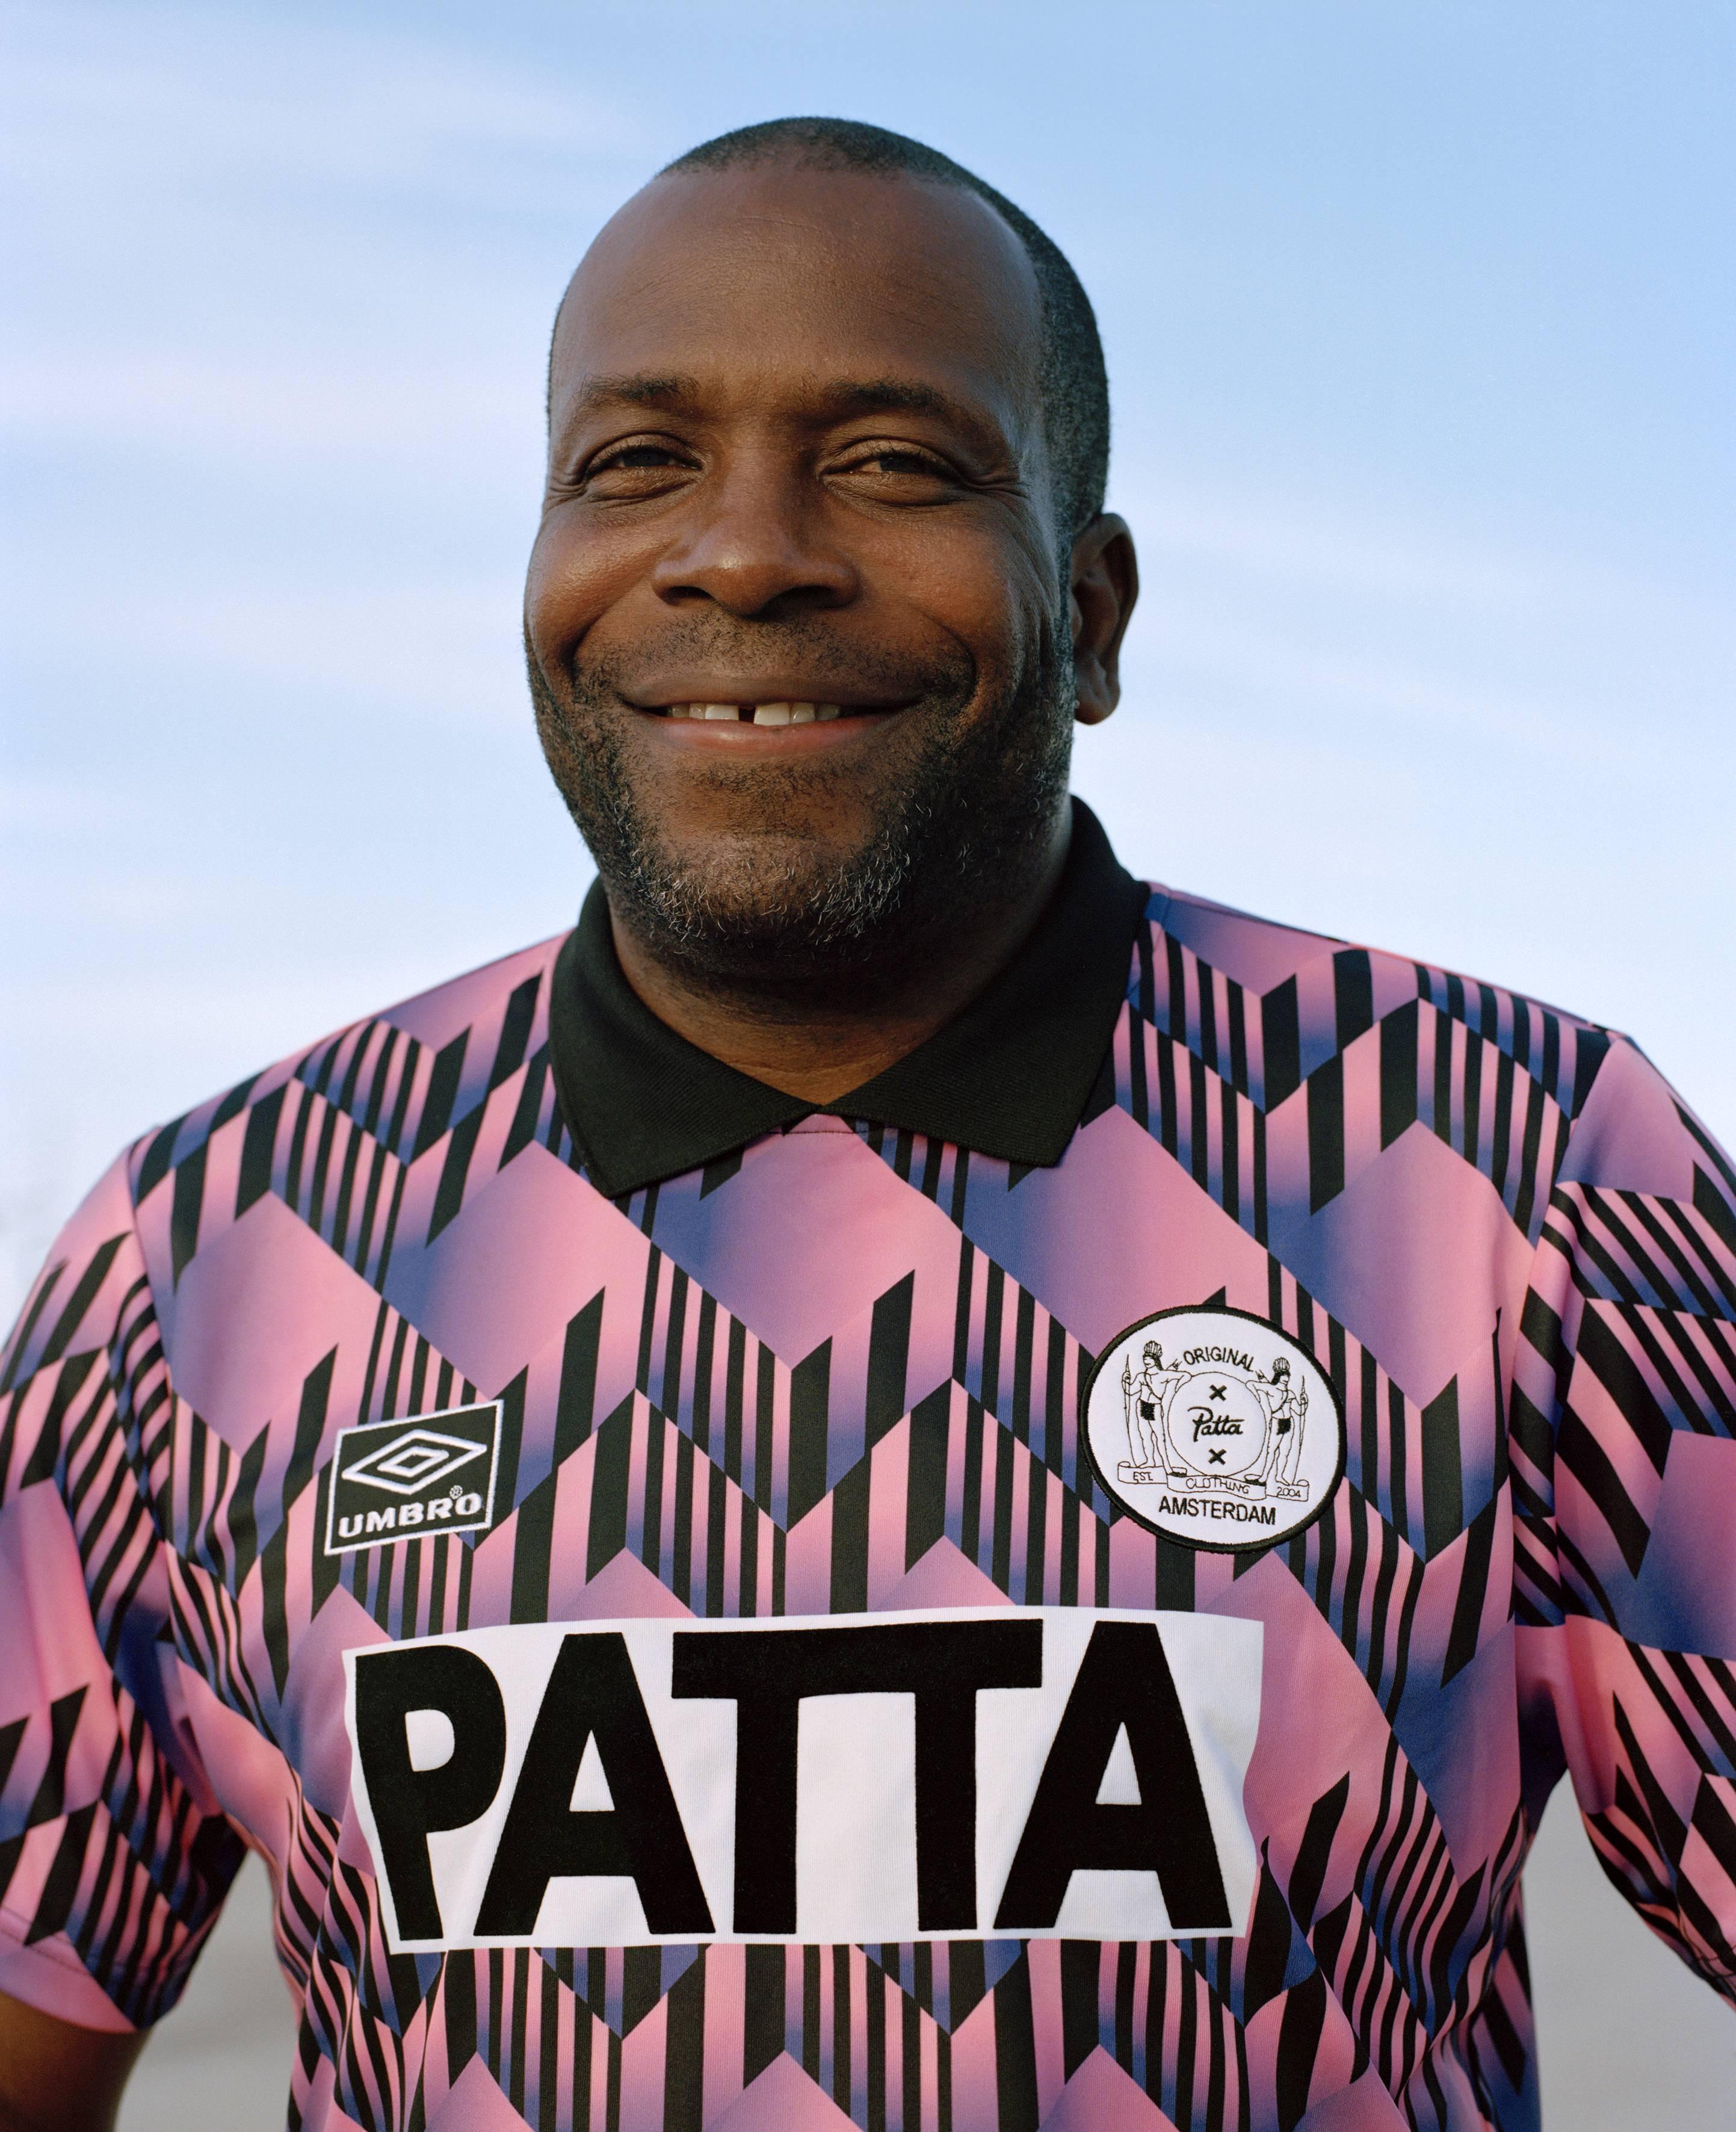 c4737f777bf Patta x Umbro Football Jersey 2018 Collection